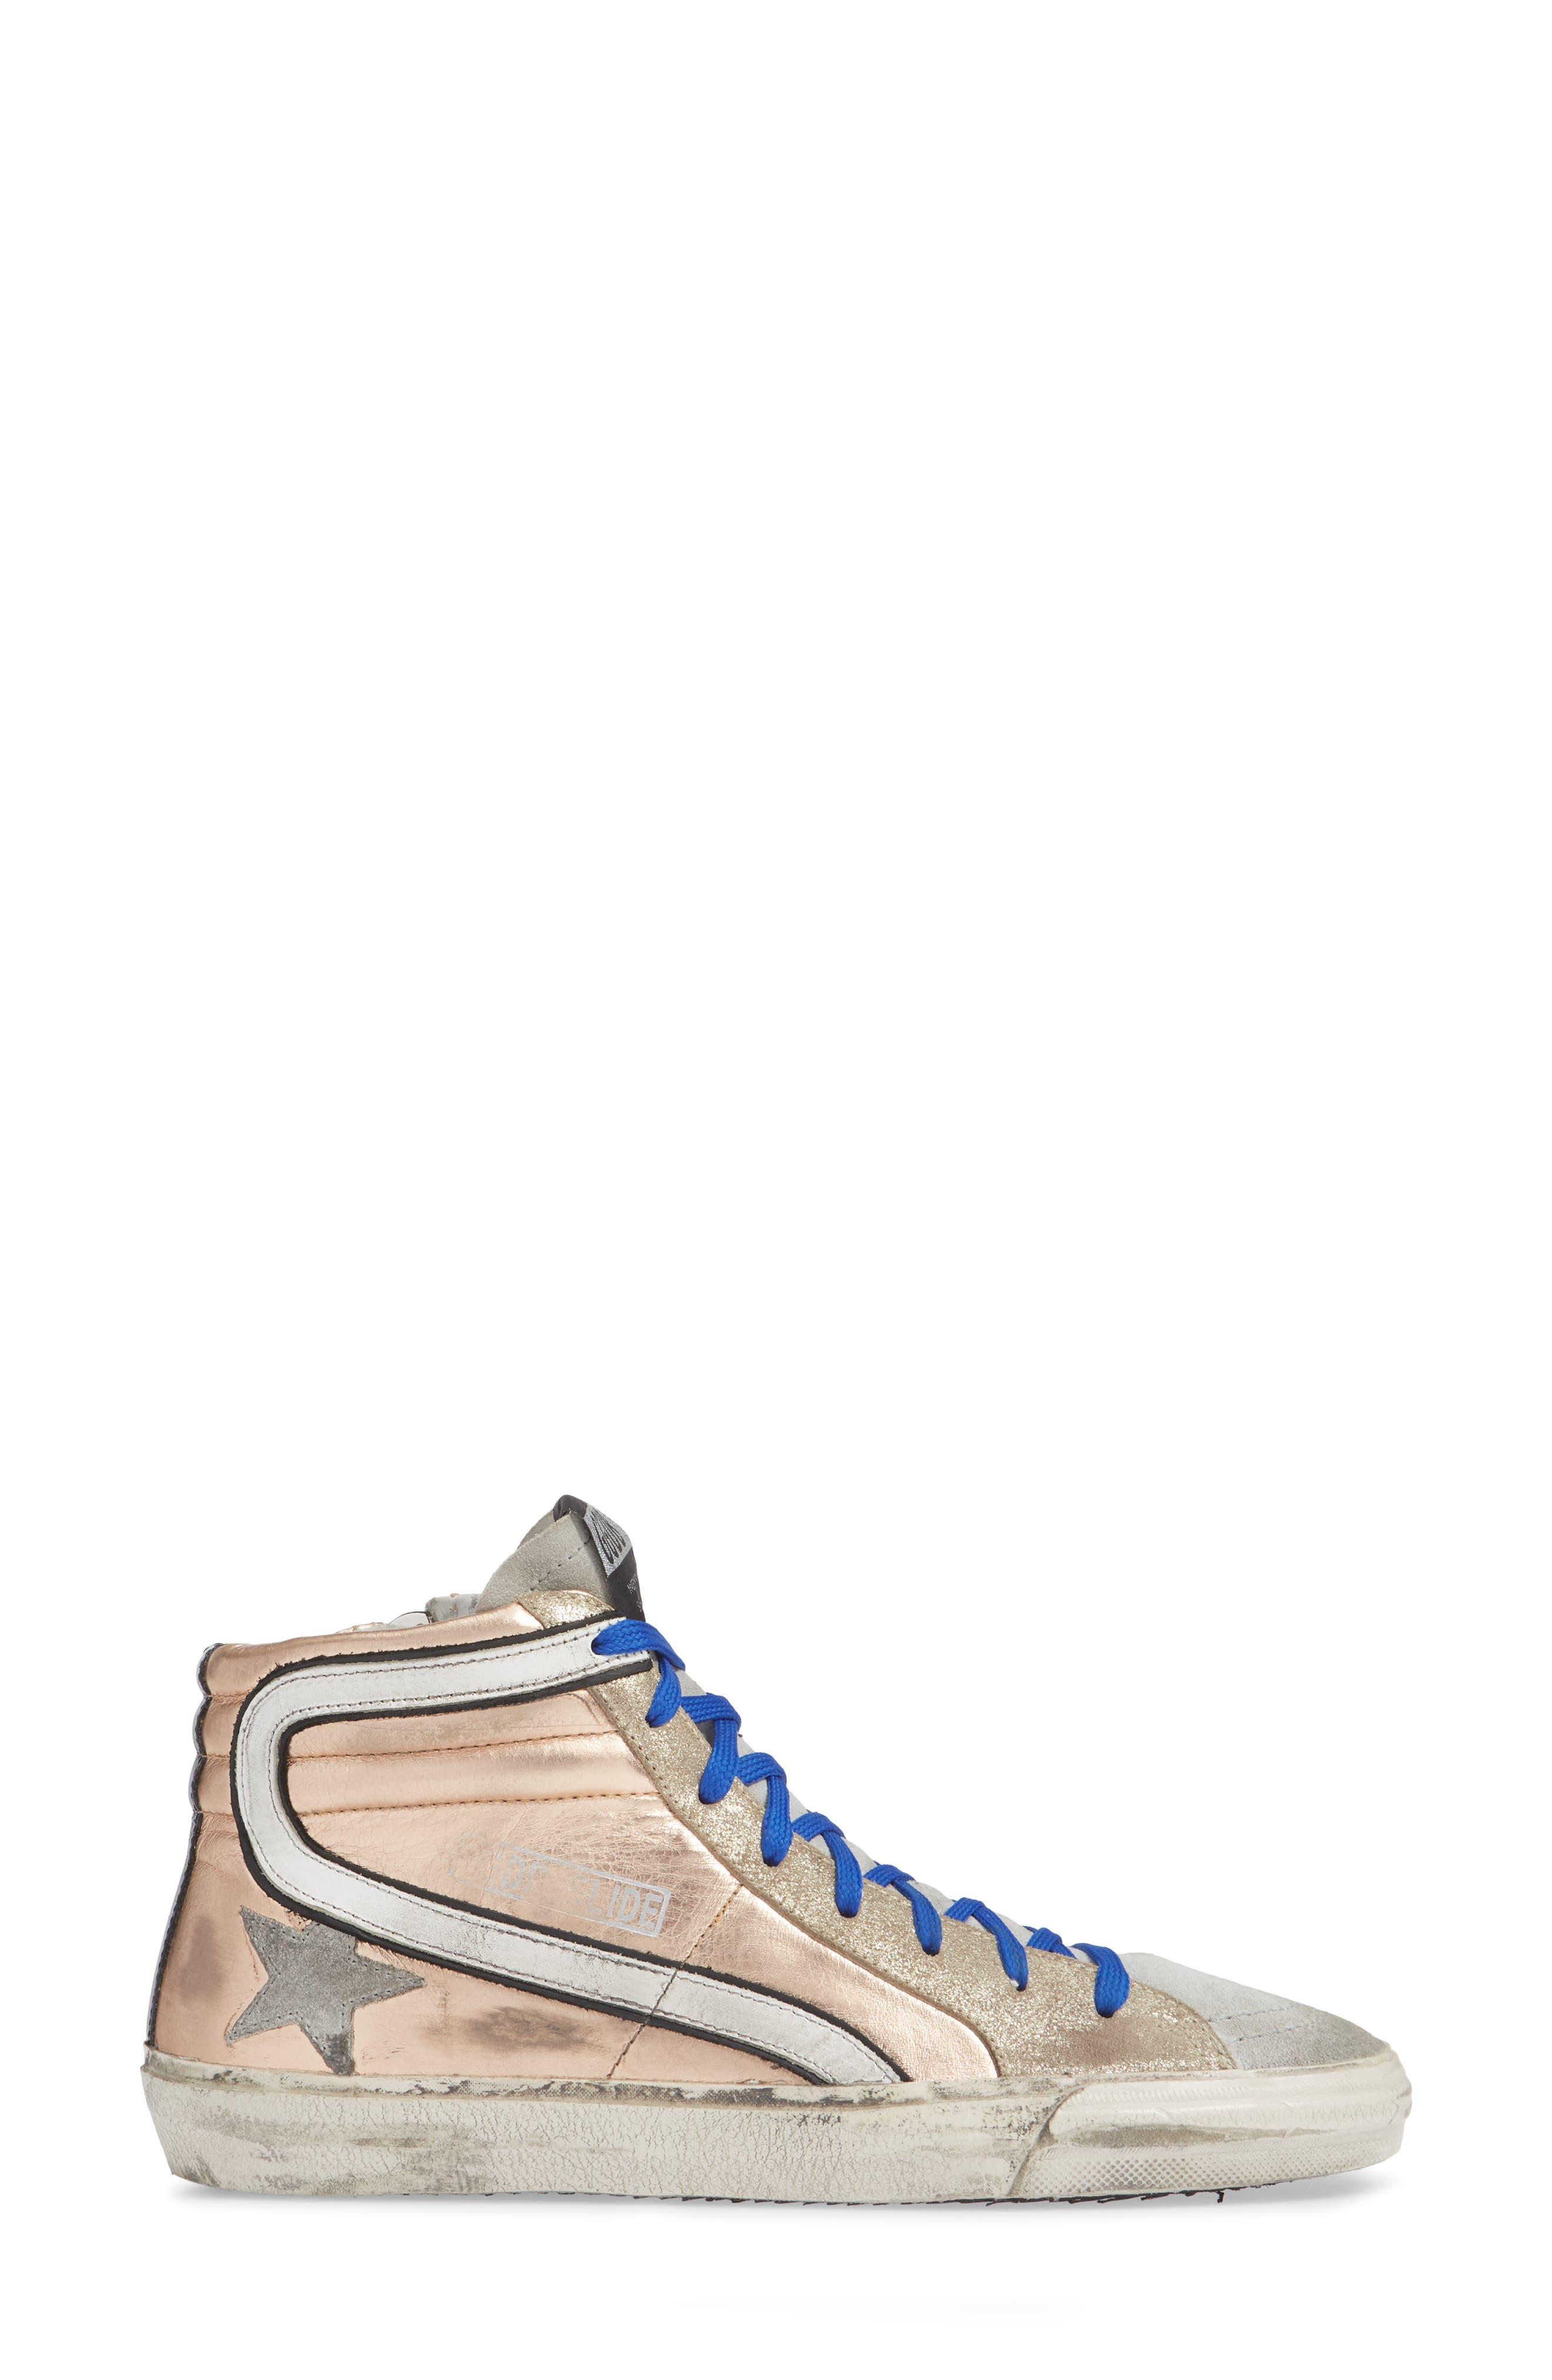 High Top Sneaker,                             Alternate thumbnail 3, color,                             ROSE GOLD/ GREY